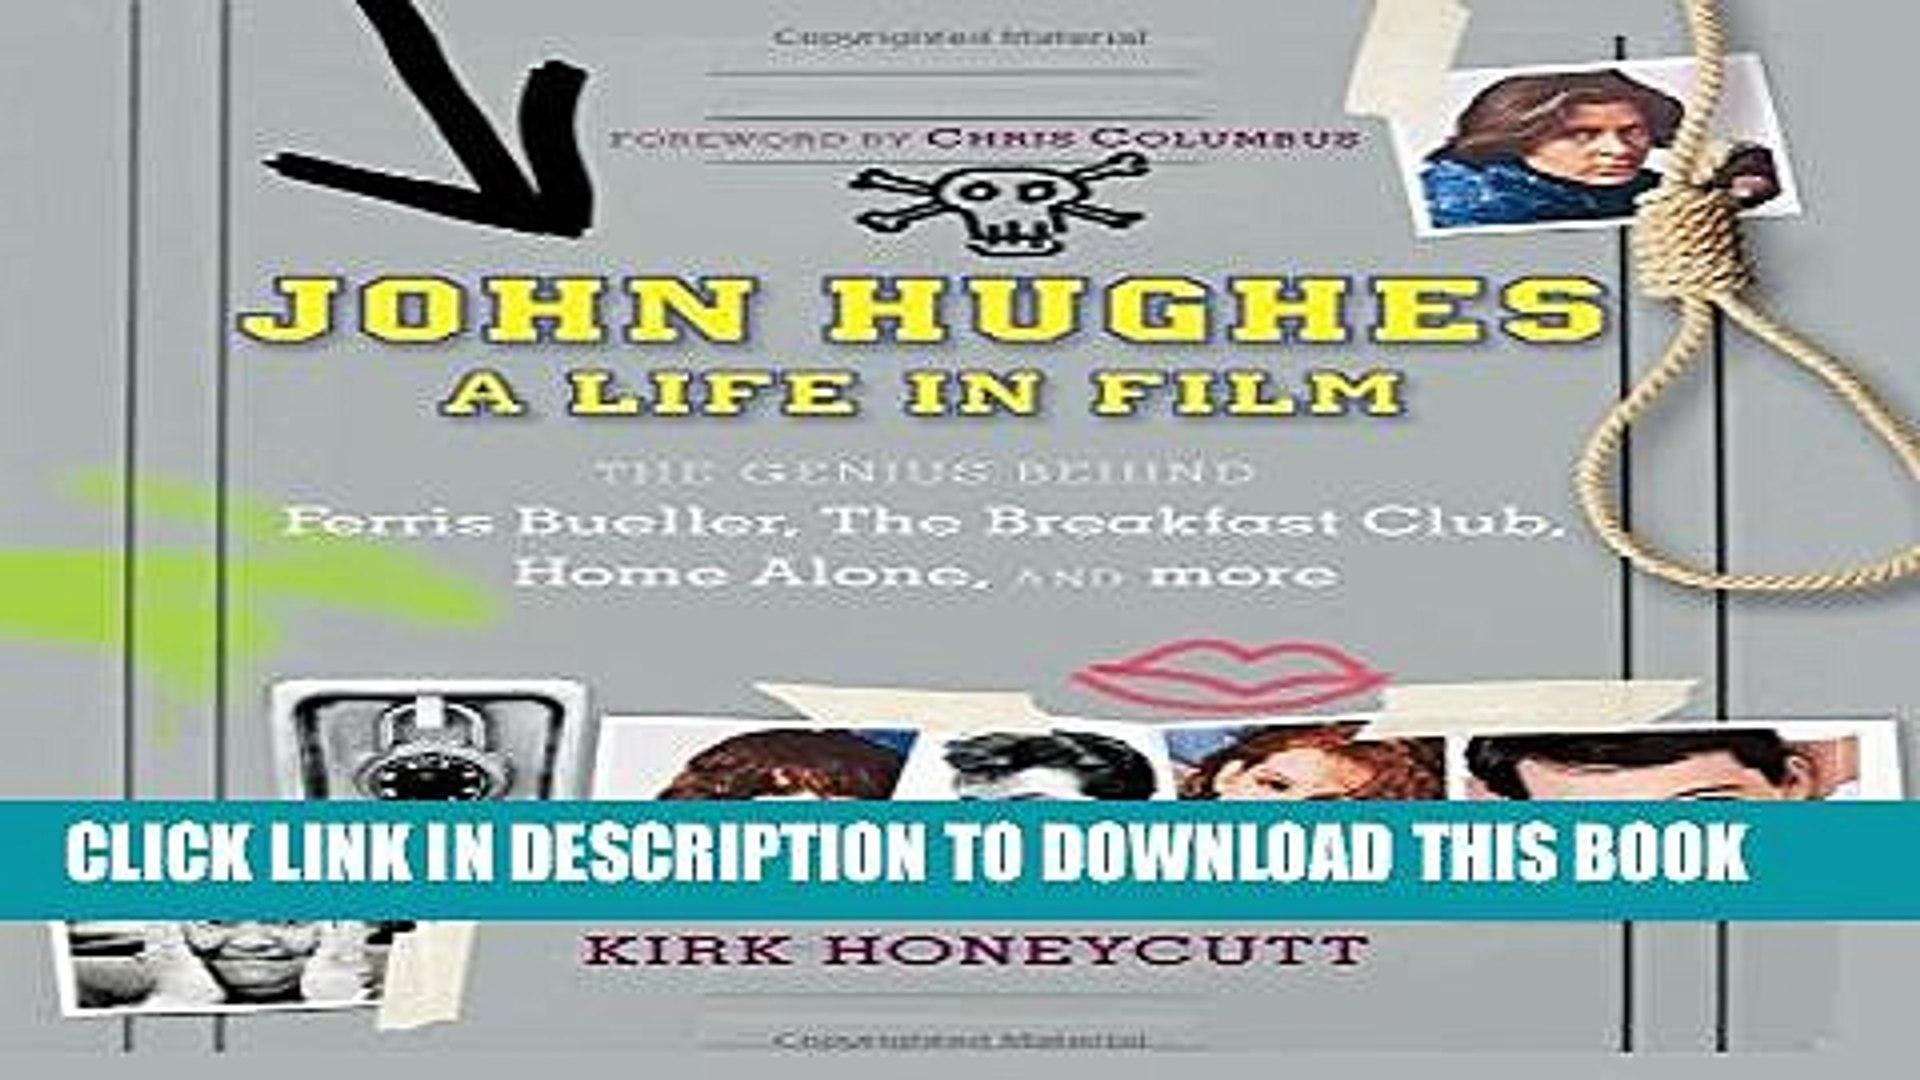 [PDF] John Hughes: A Life in Film: The Genius Behind Ferris Bueller, The Breakfast Club, Home